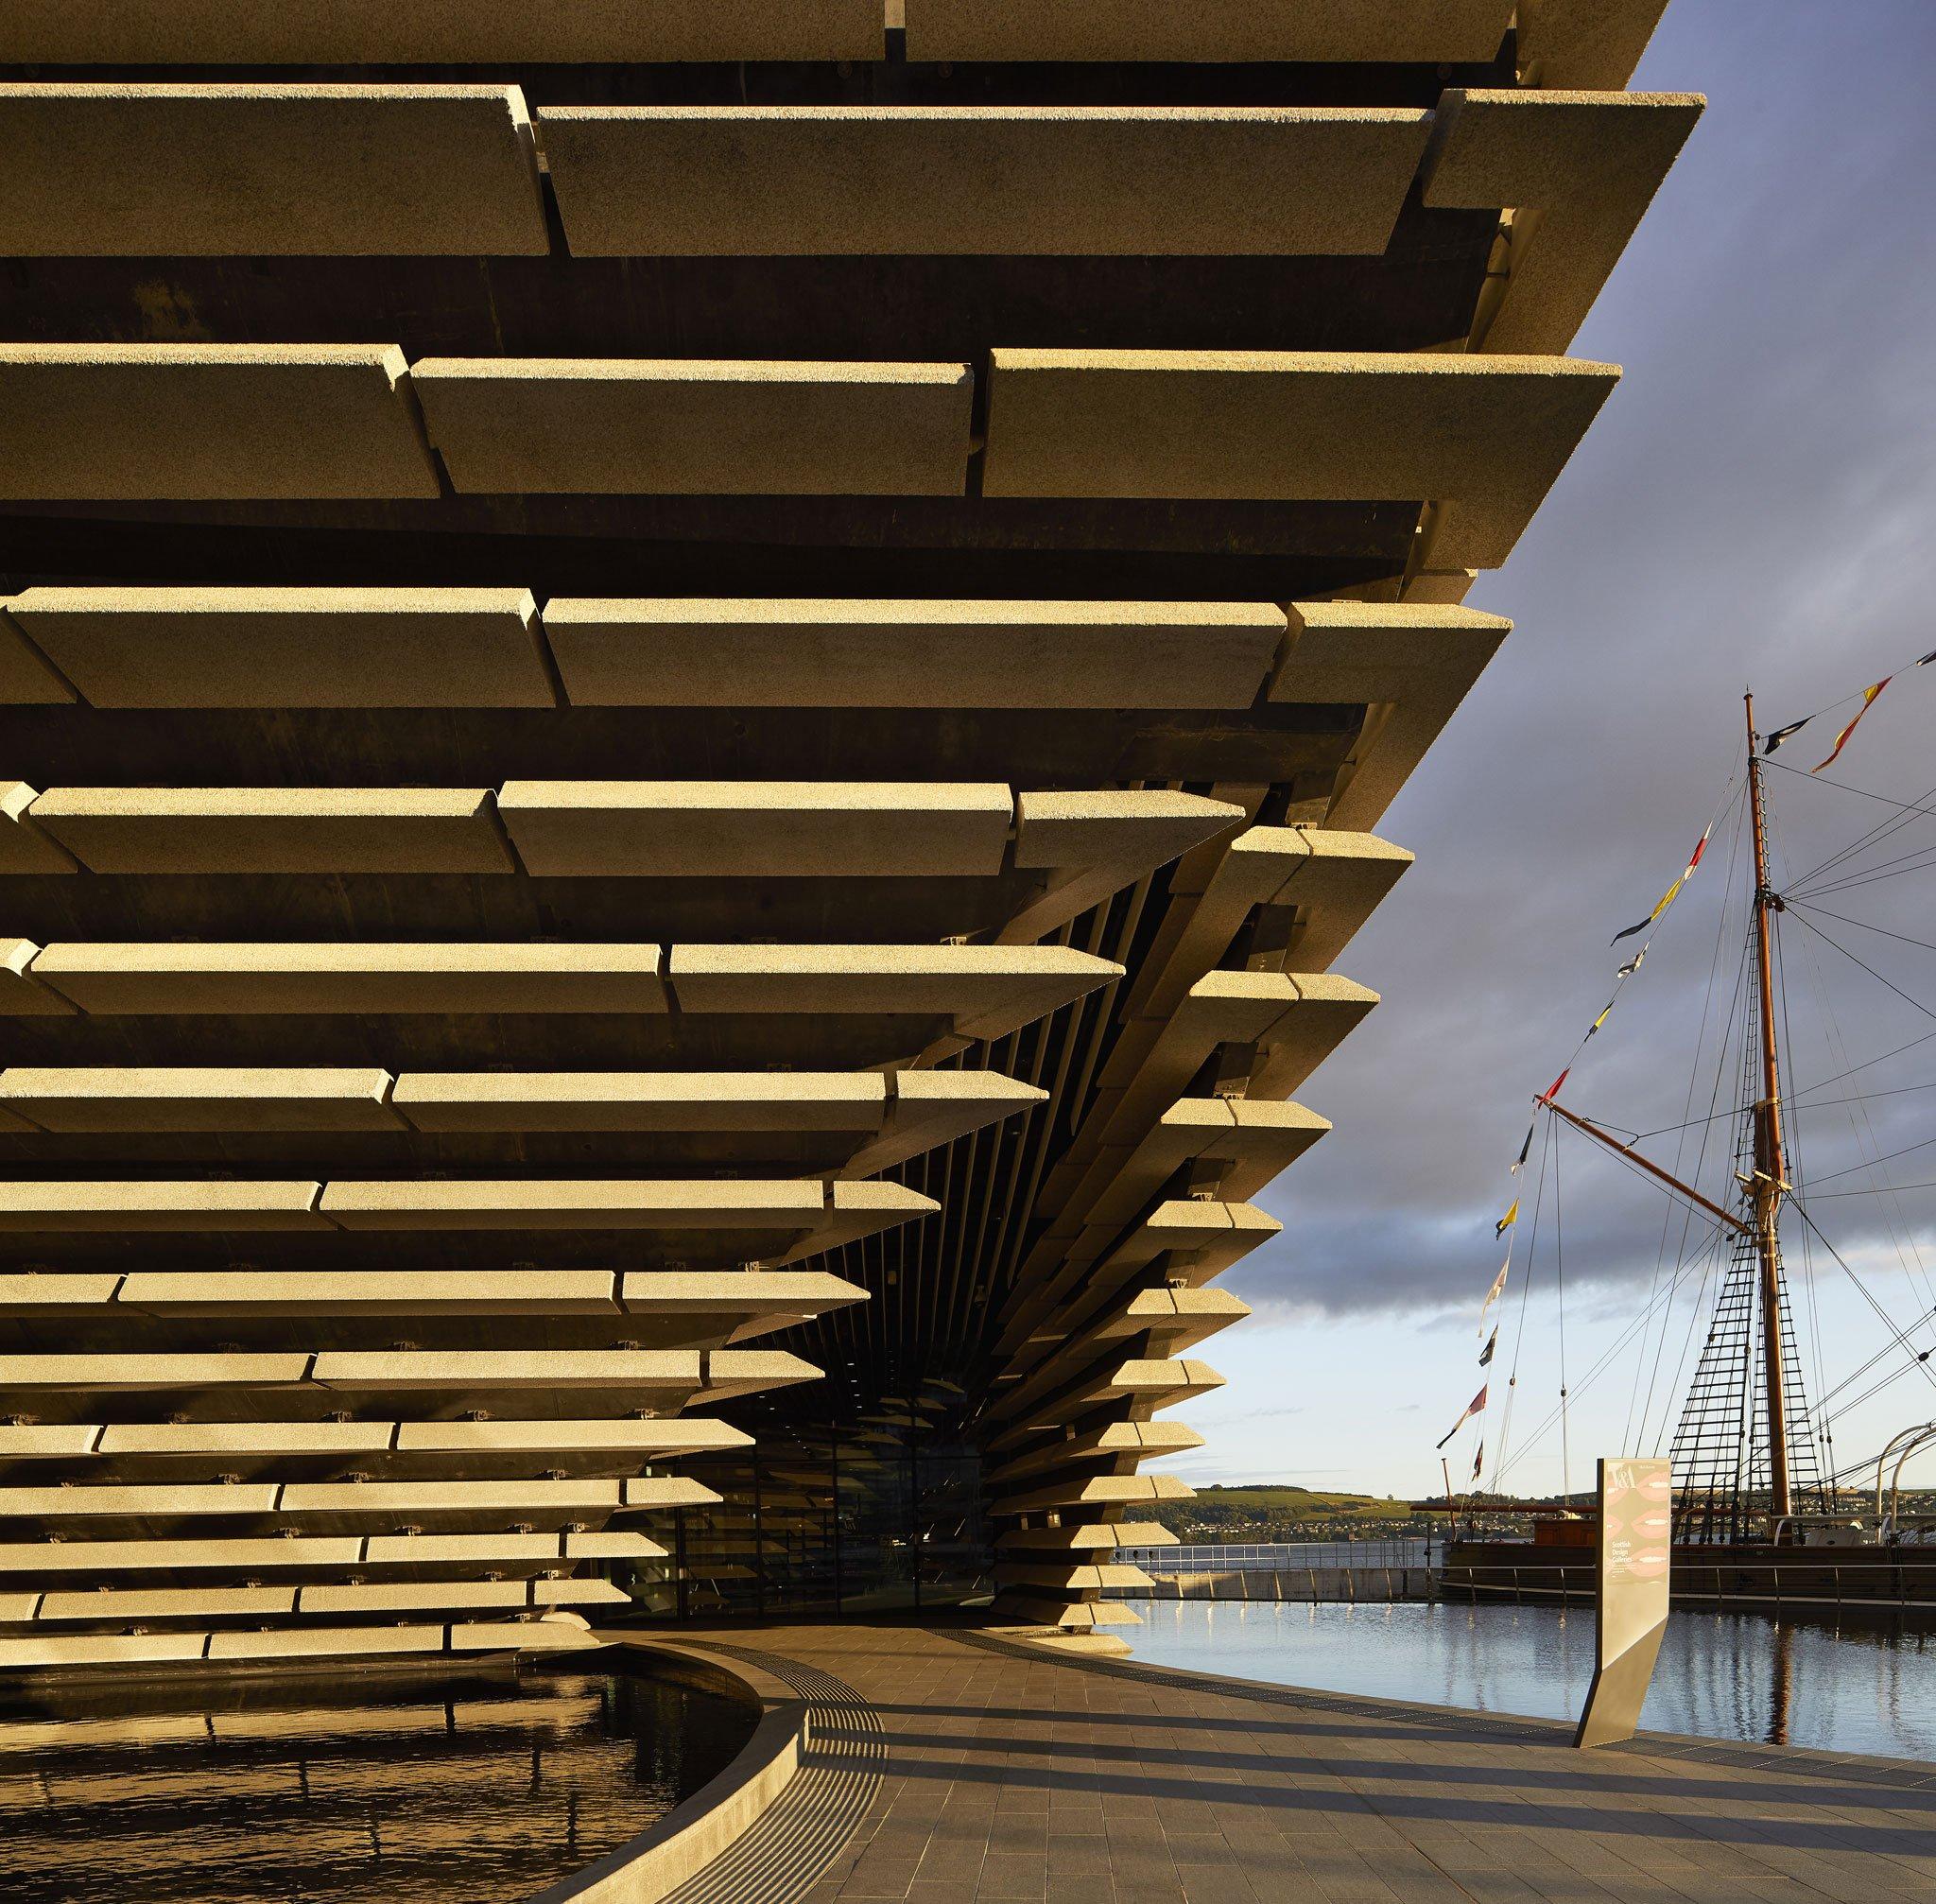 V&A Dundee Scotland por Kengo Kuma. Fotografía por ©Hufton+Crow